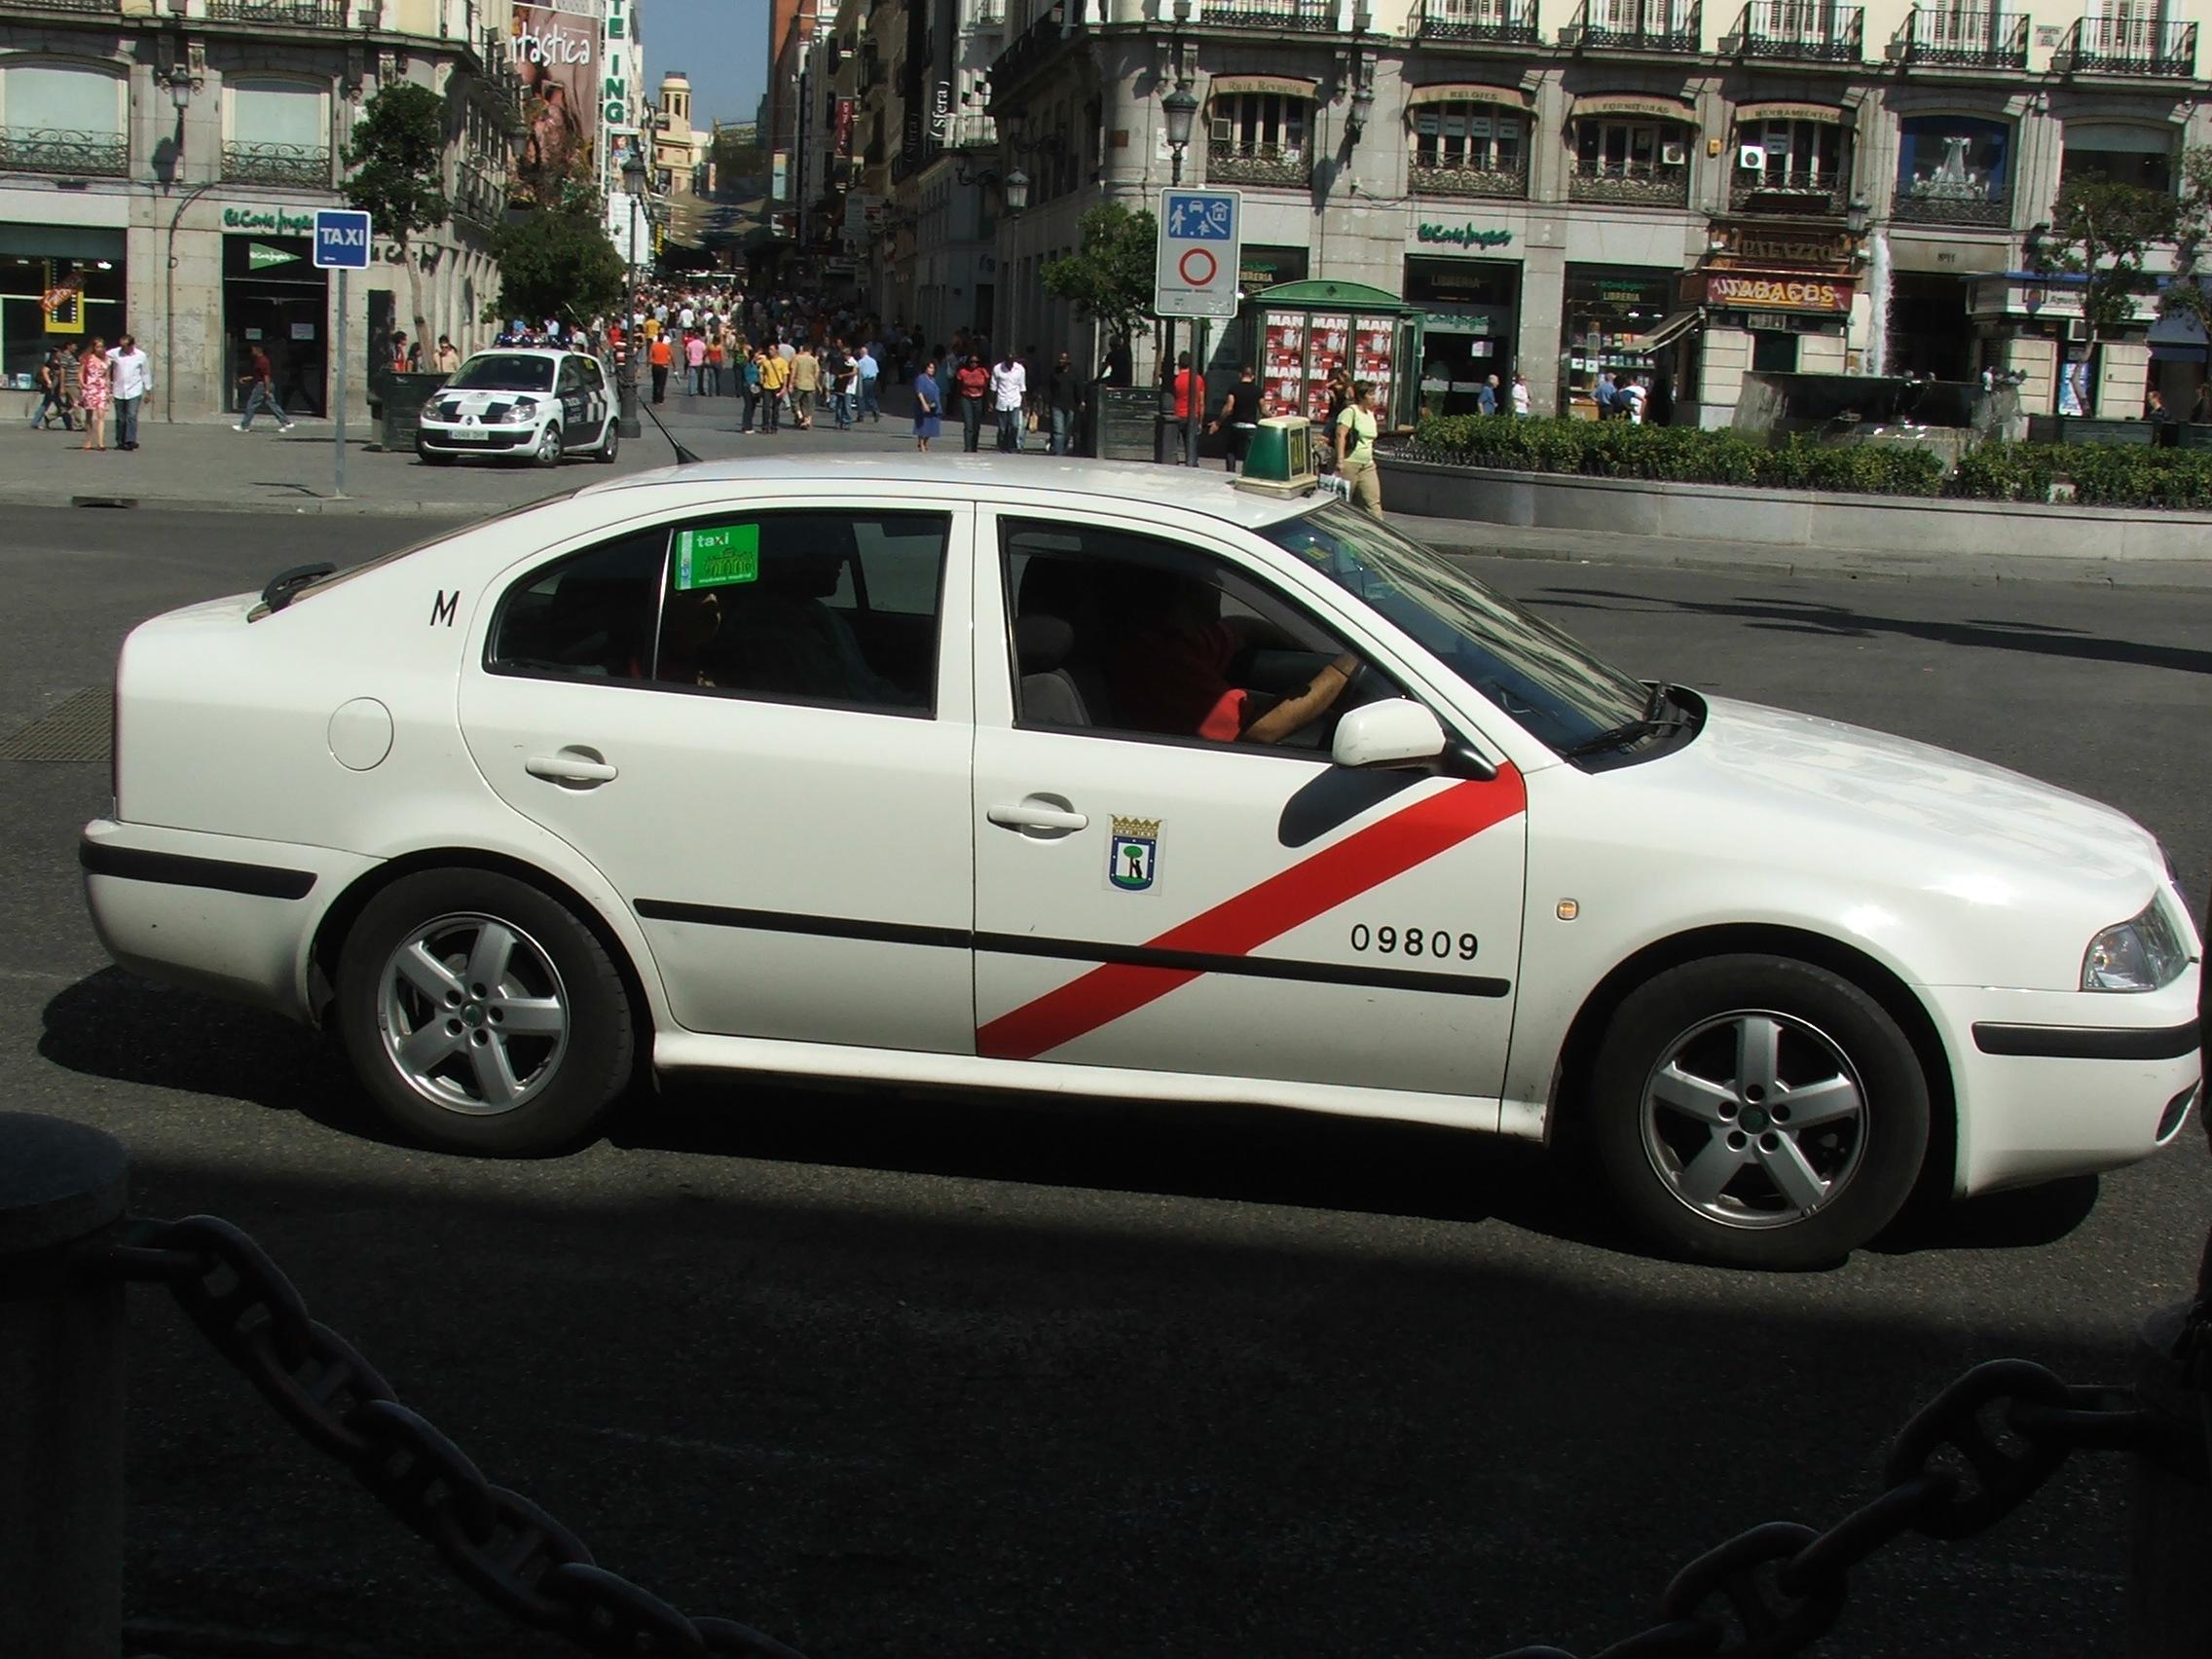 File Skoda Octavia Taxi Madrid 3859 Jpg Wikimedia Commons